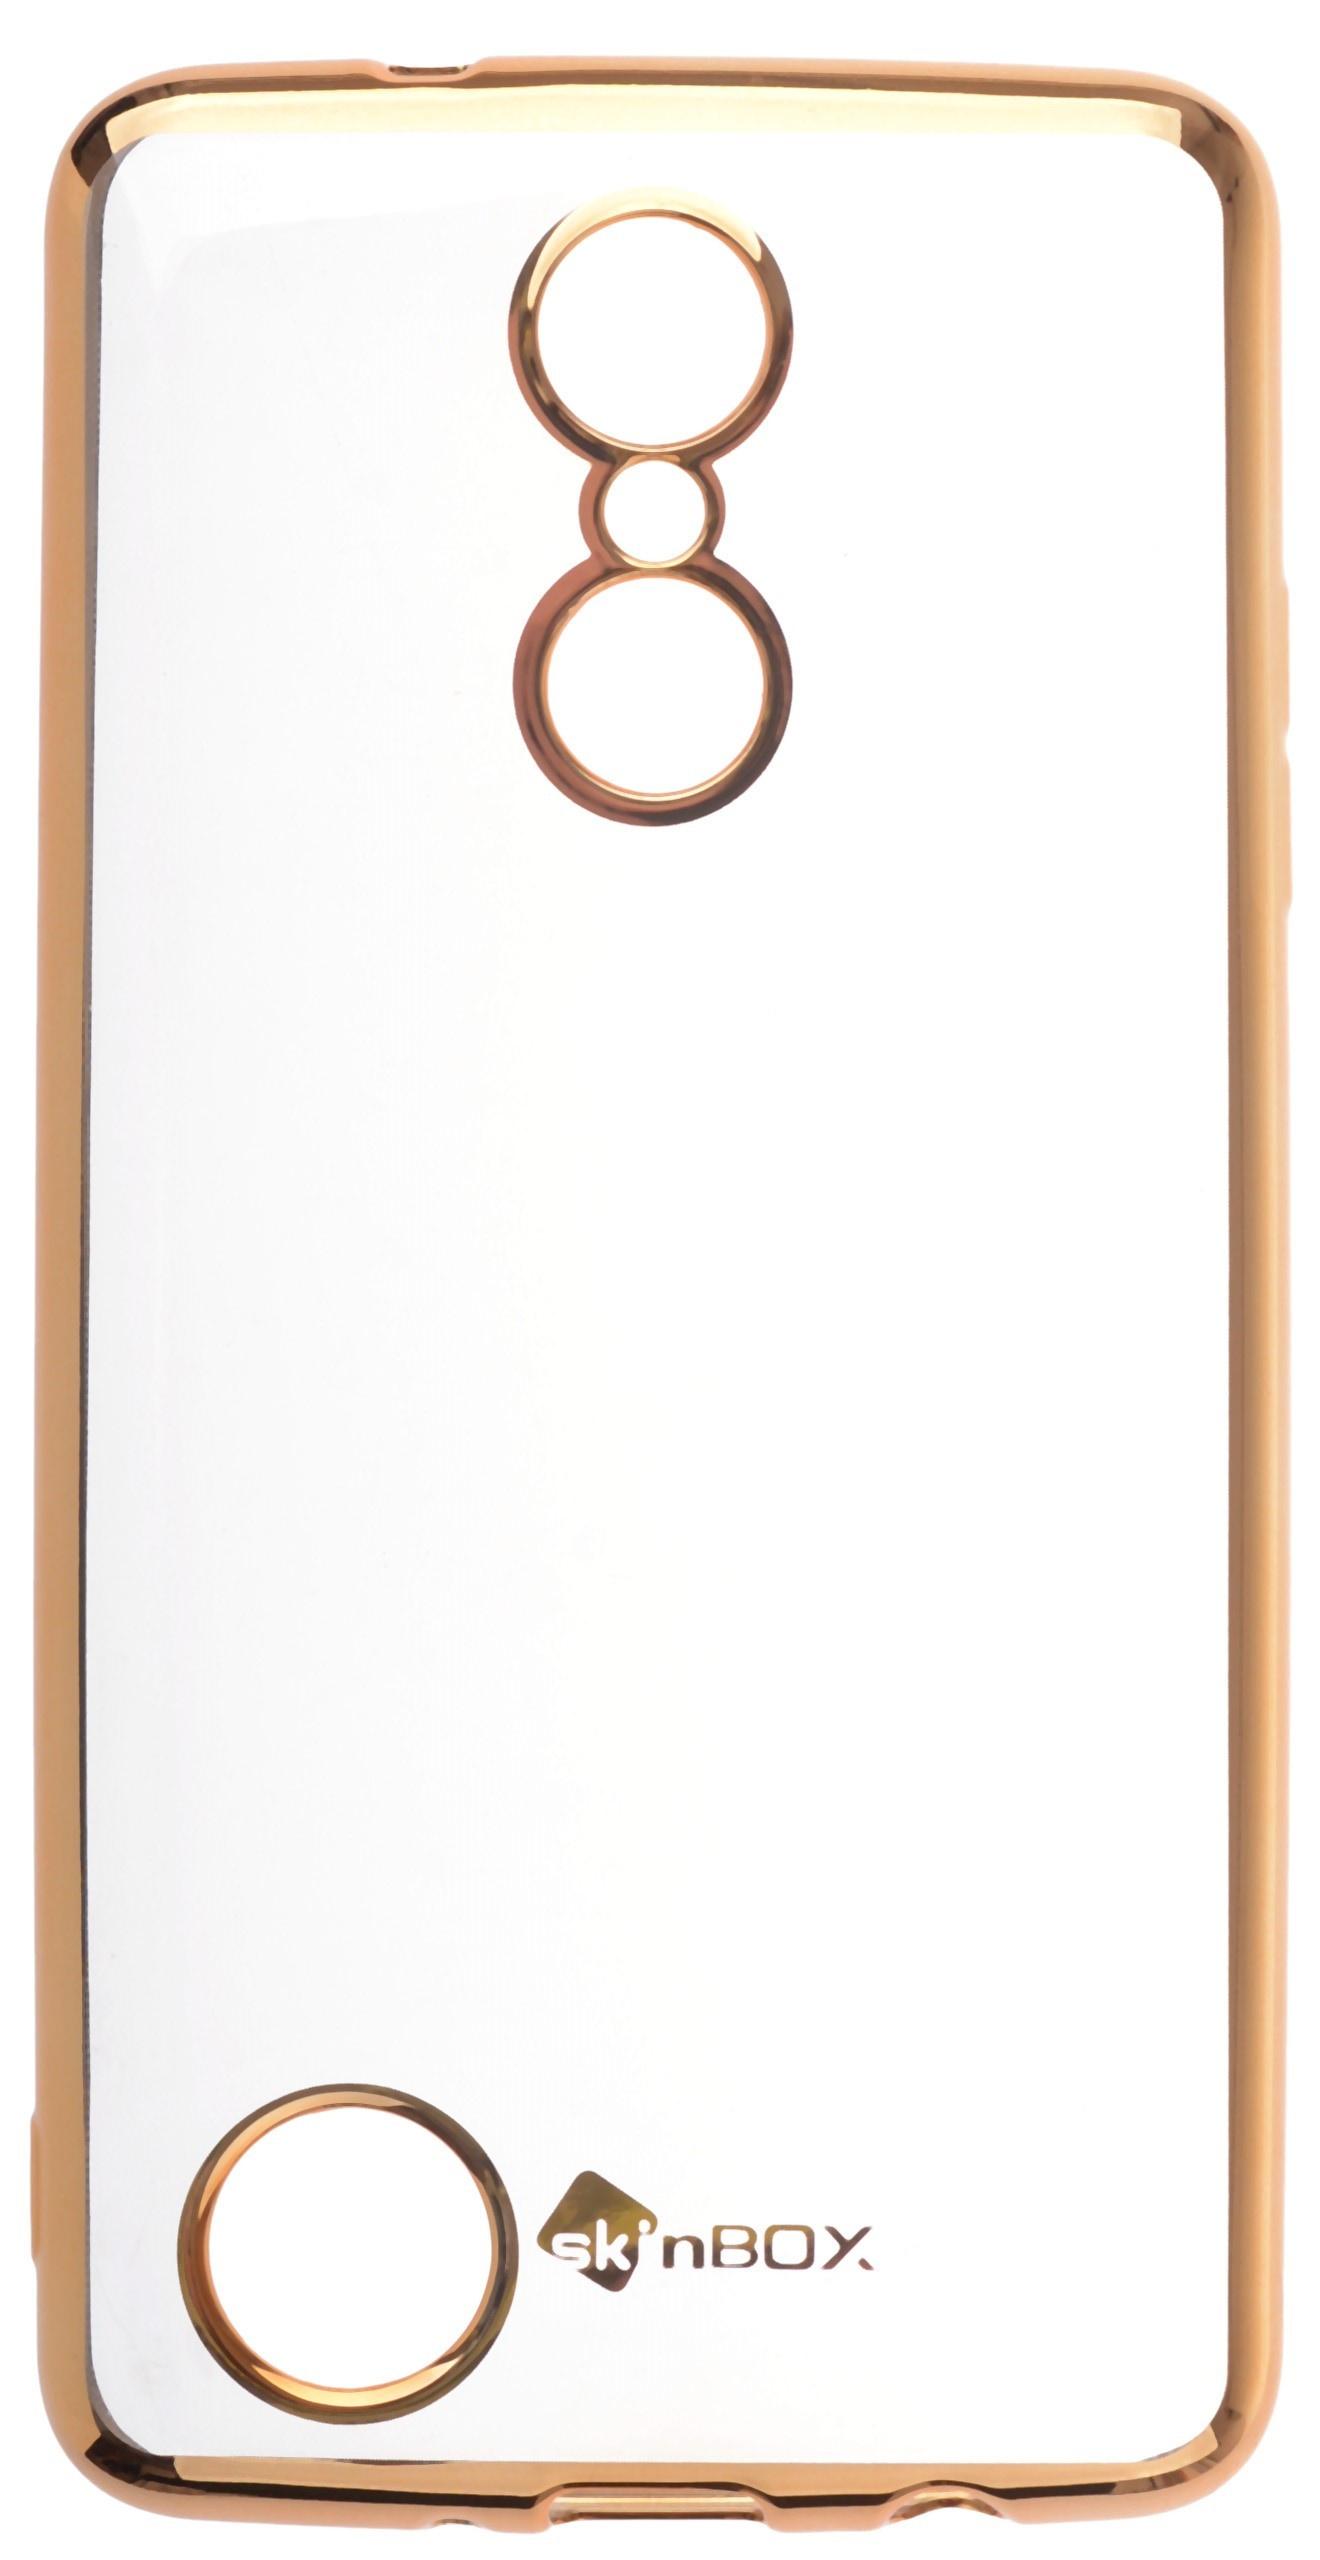 Чехол для сотового телефона skinBOX Silicone chrome border, 4630042529793, золотой skinbox 4people slim silicone чехол накладка для xiaomi redmi 4a transparent